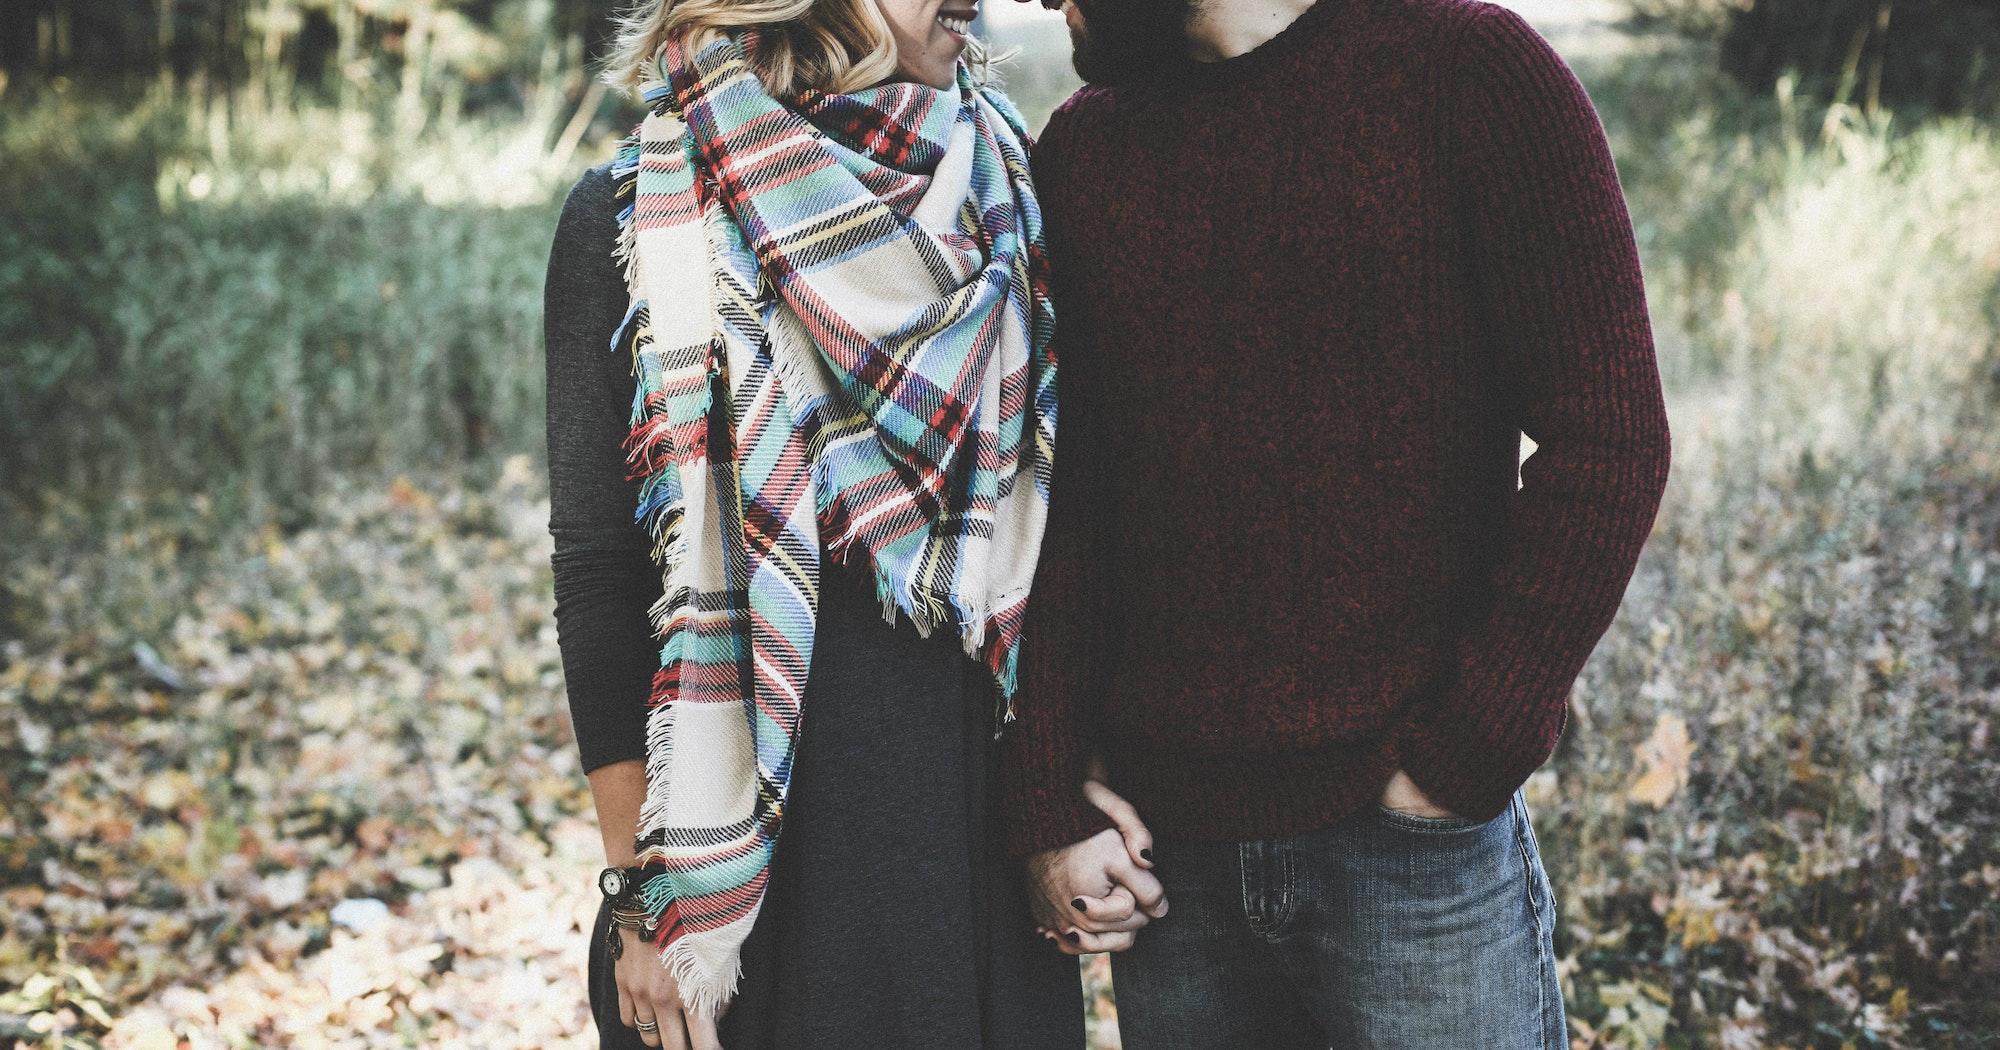 God dating relationships best free online dating app